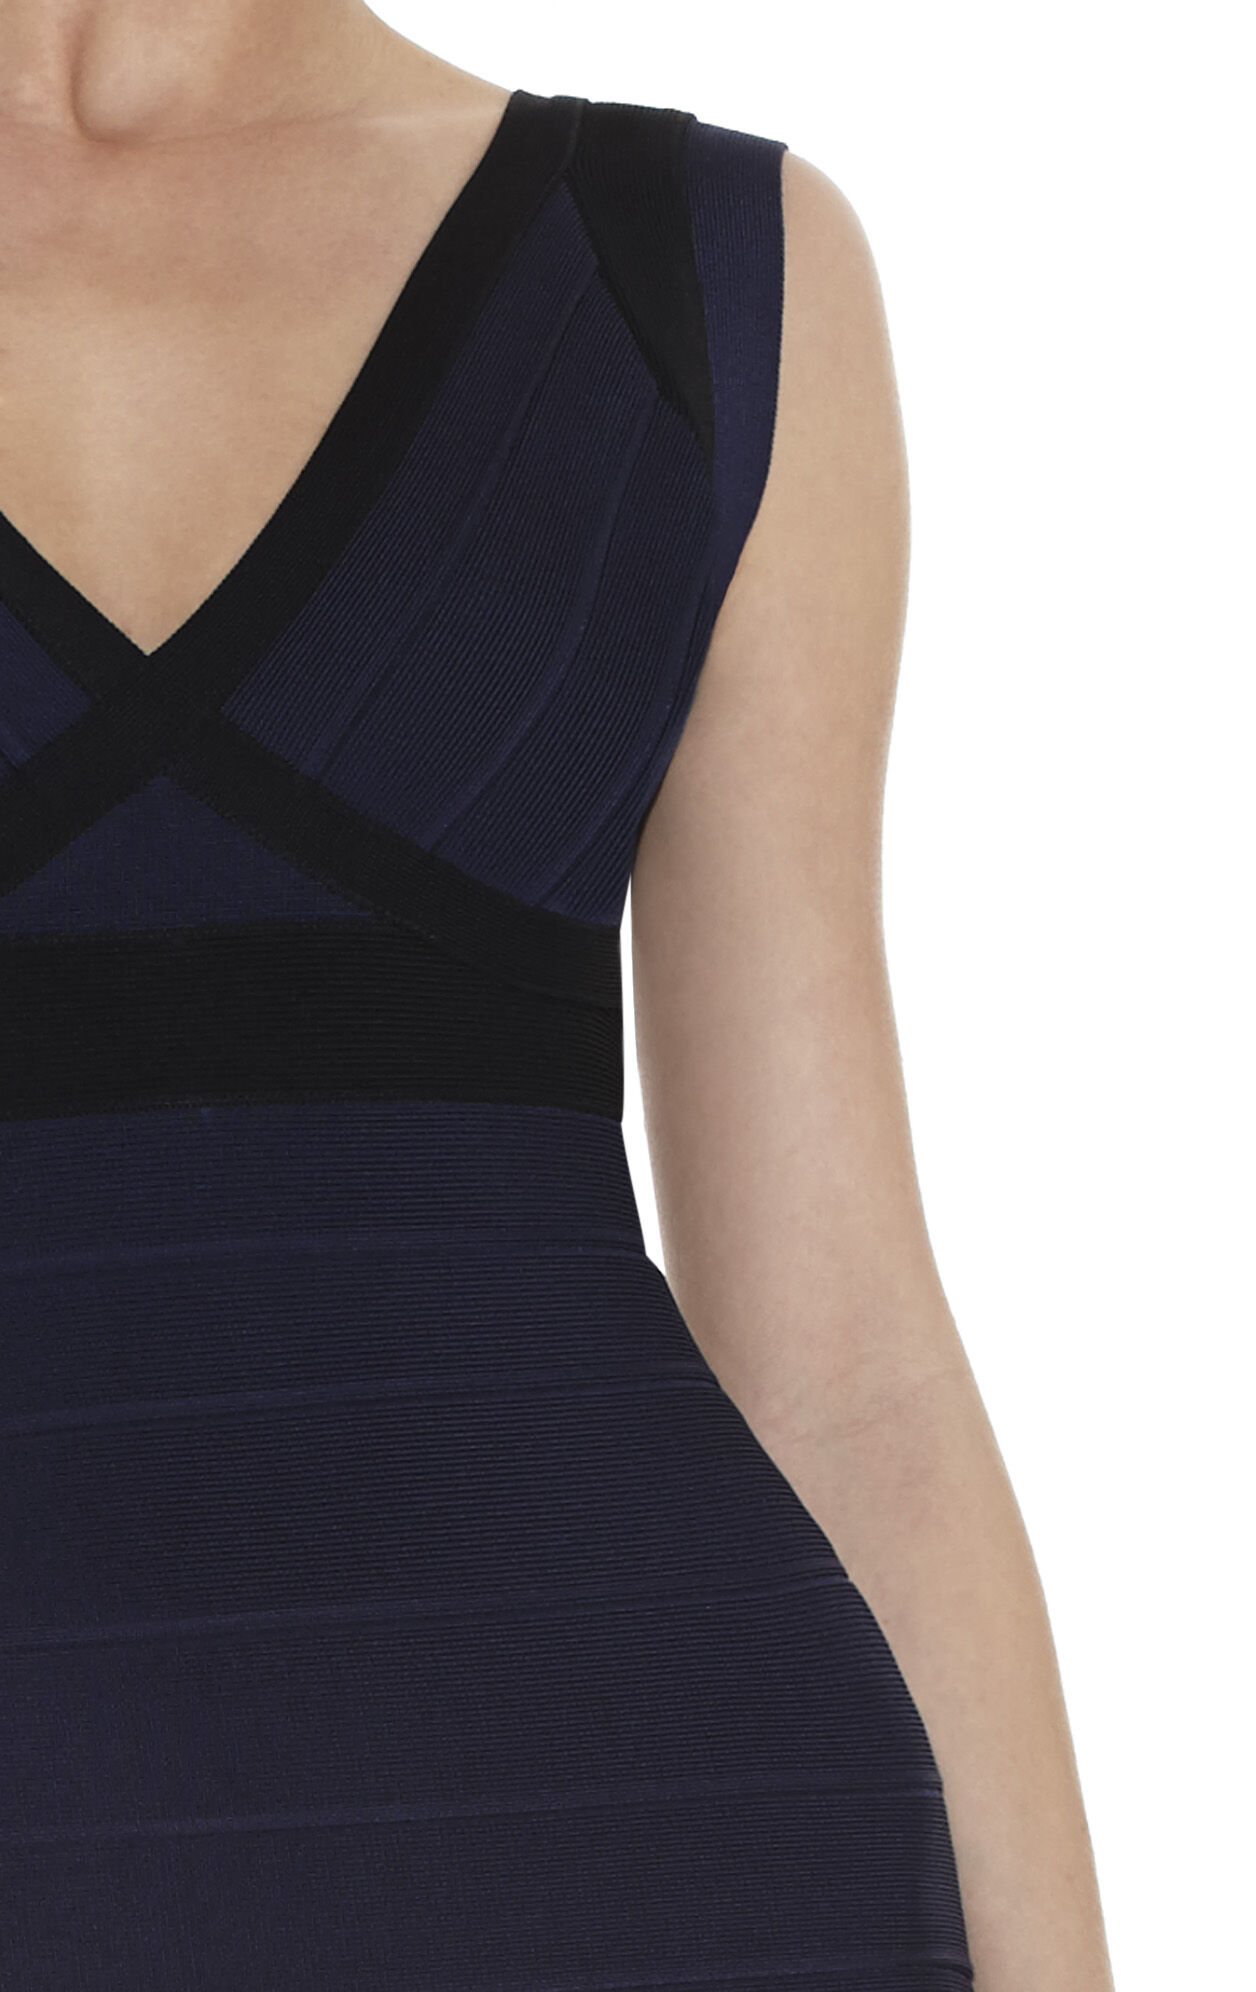 Ilia Colorblocked Dress